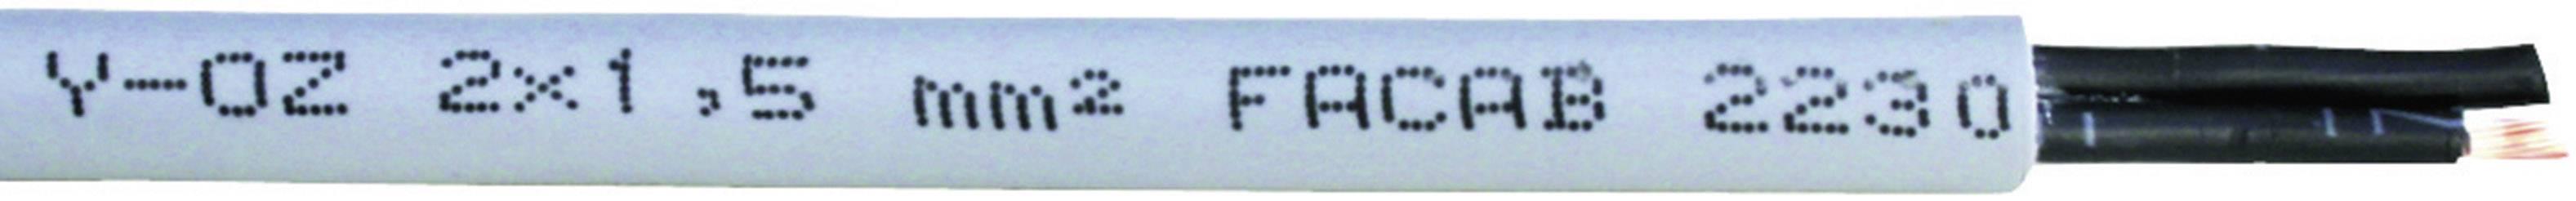 Riadiaci kábel Faber Kabel YSLY-OZ 030868, 3 x 0.50 mm², vonkajší Ø 5.10 mm, 500 V, metrový tovar, sivá